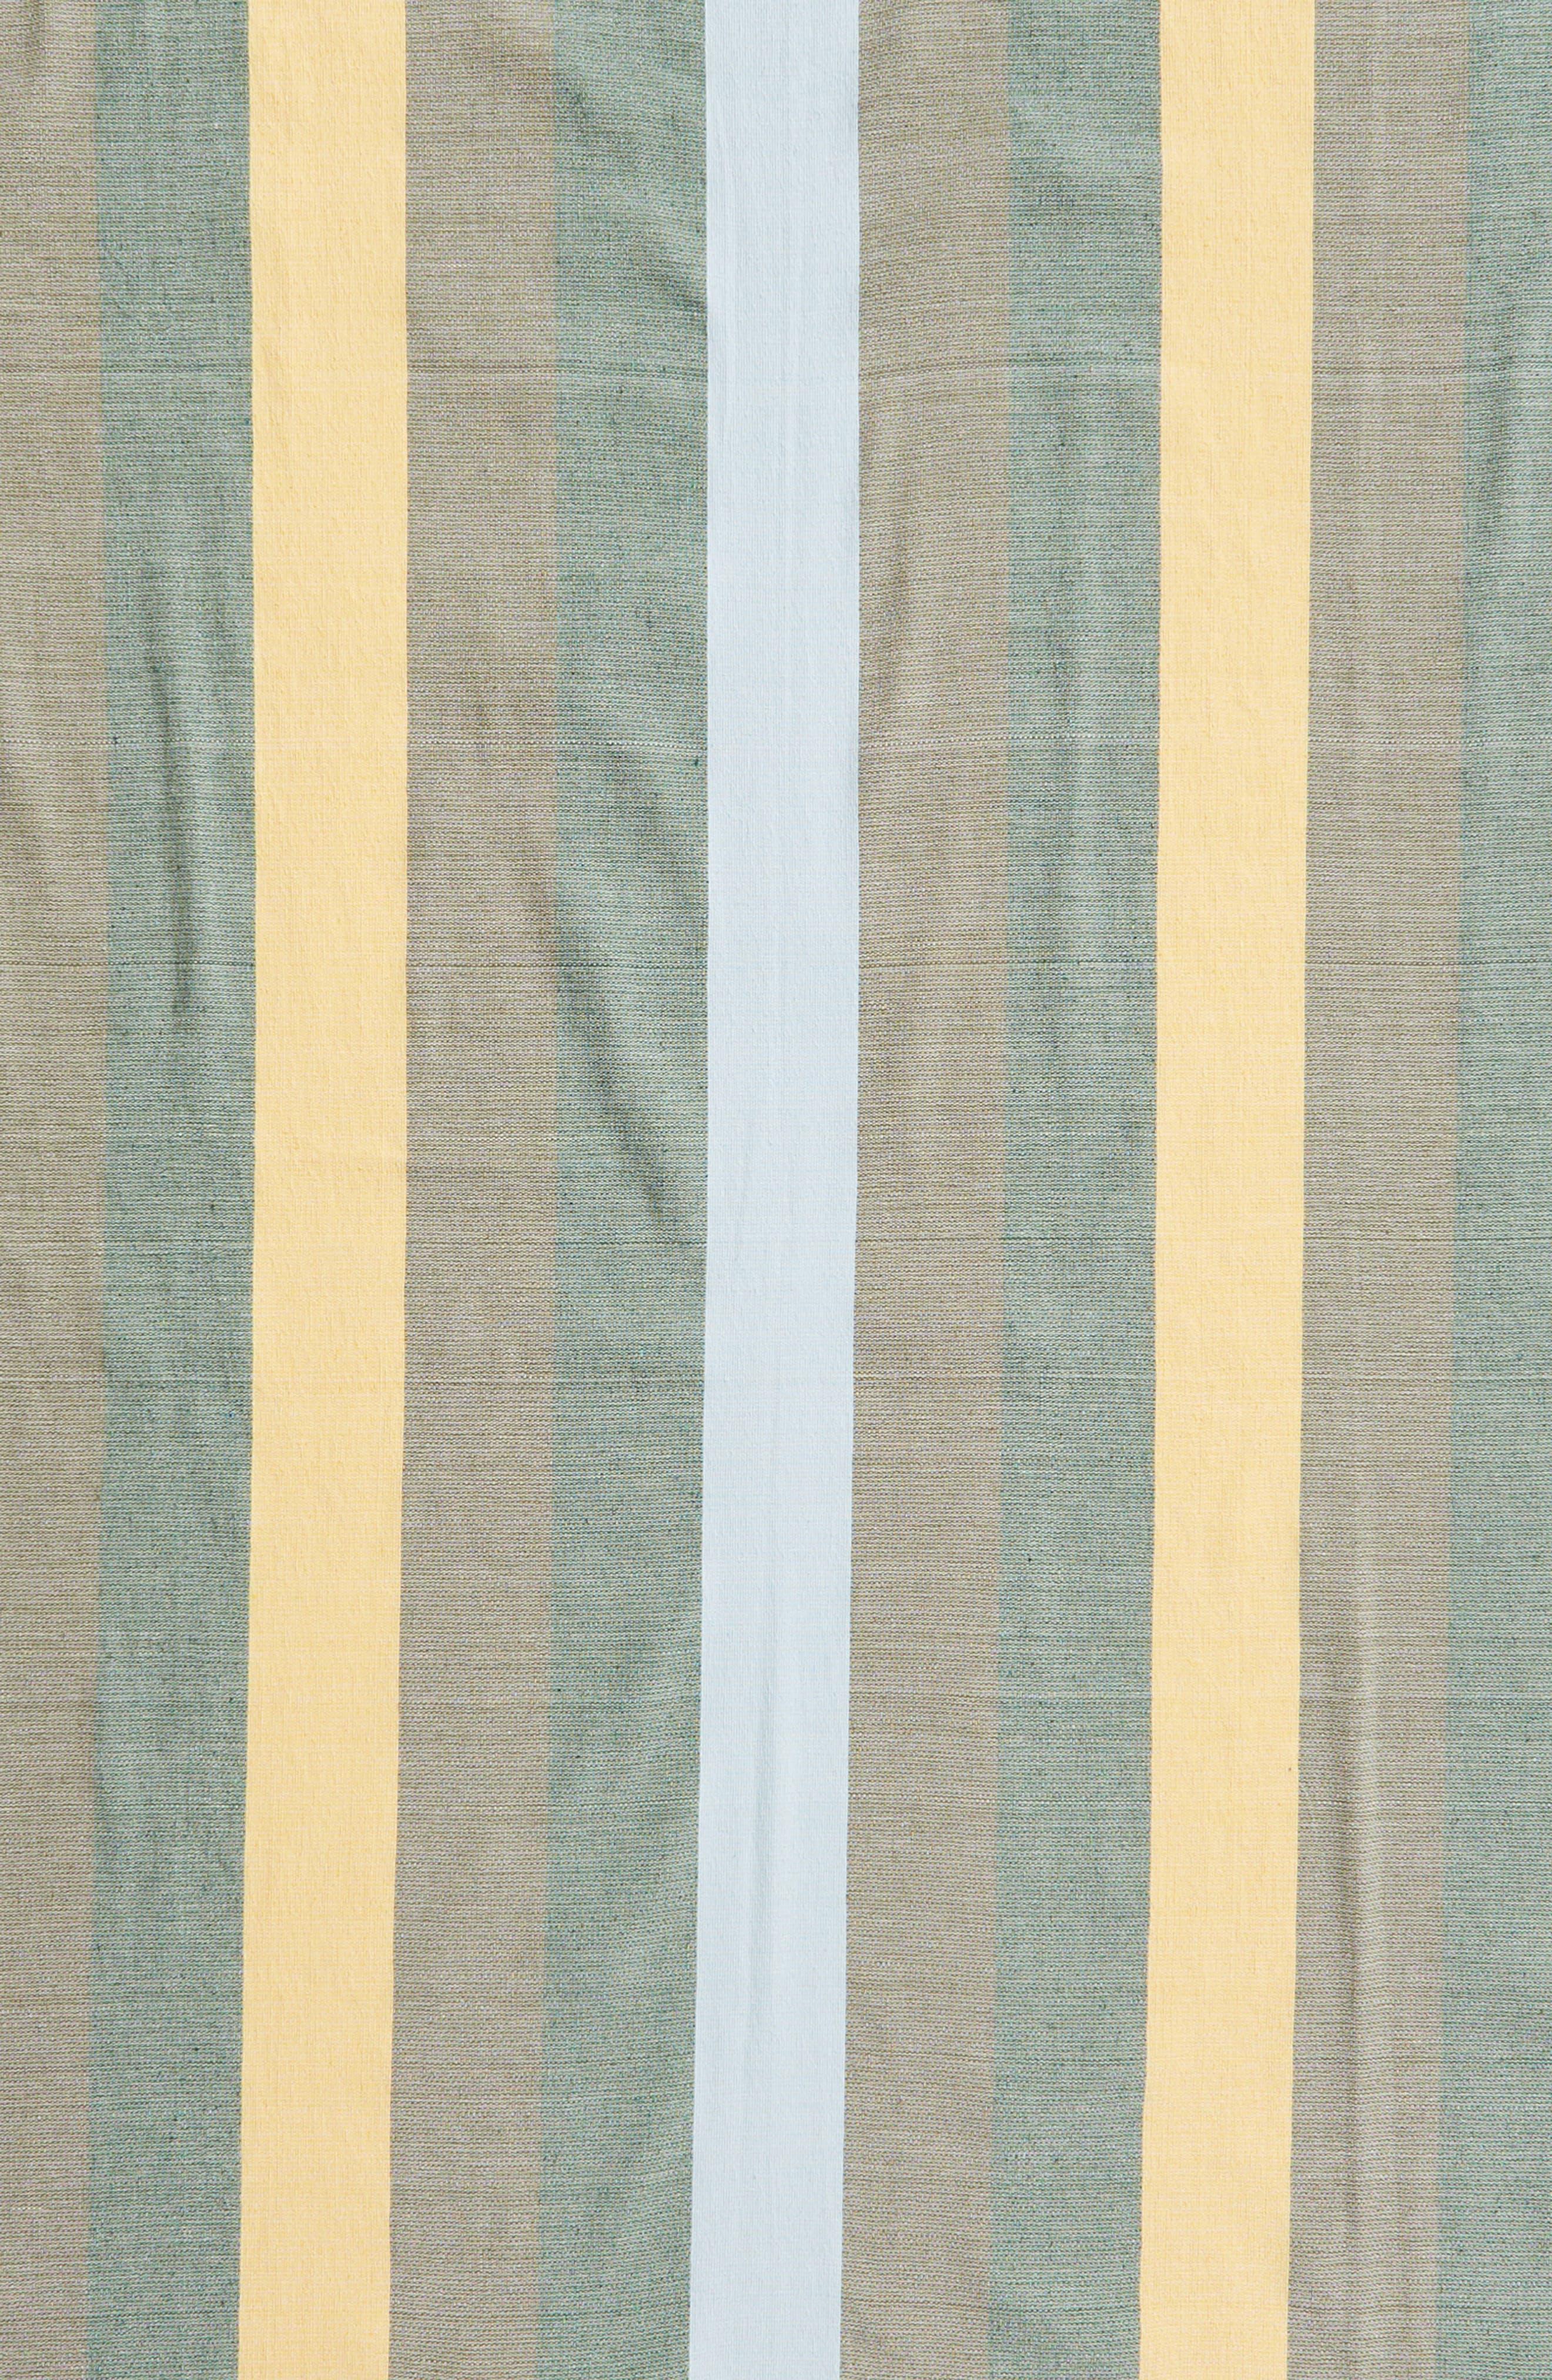 Forest Stripe Woven Cotton Blanket,                             Alternate thumbnail 3, color,                             020